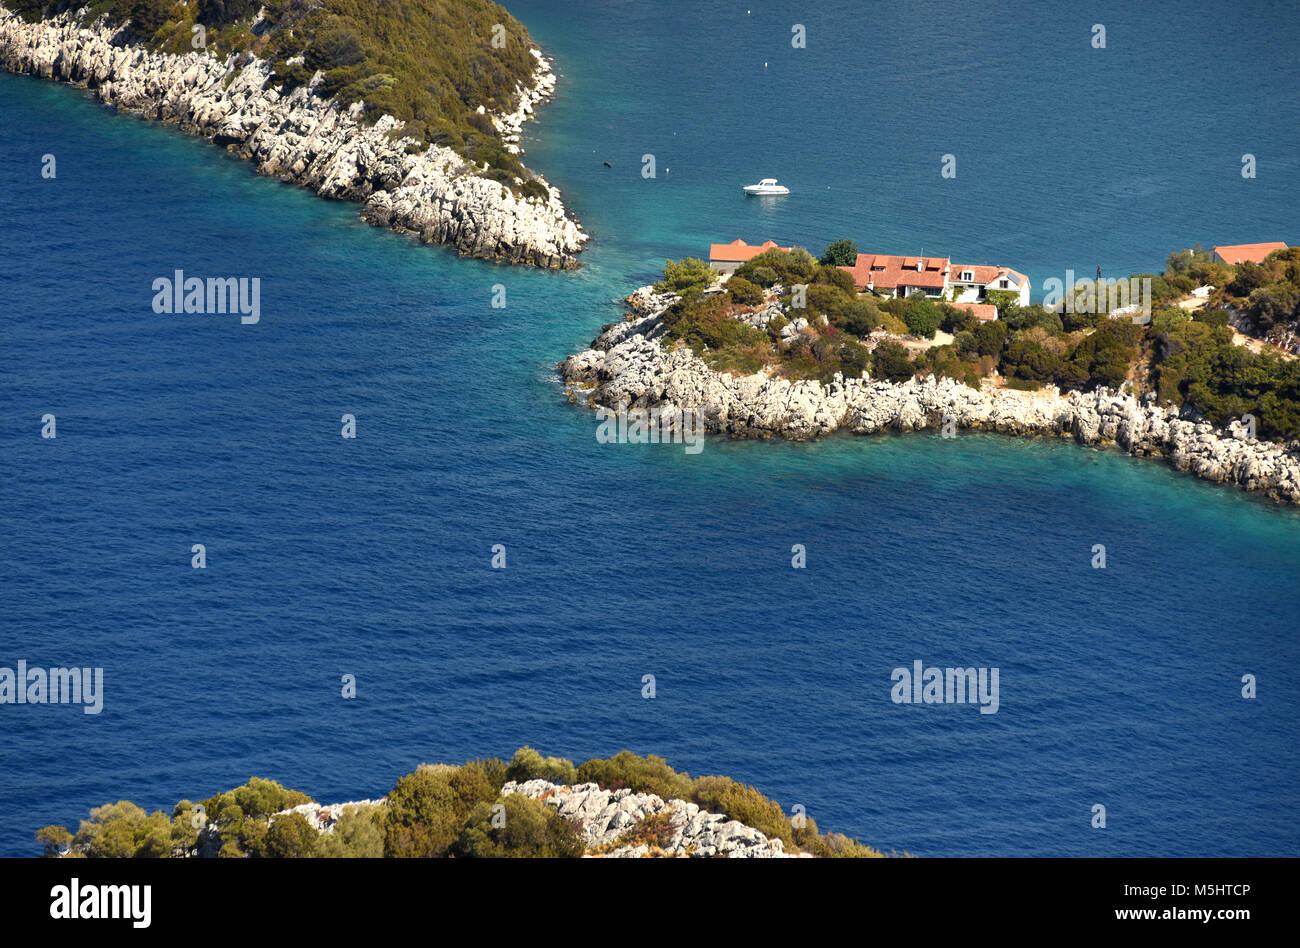 Adriatic island of Lastovo, Croatia. Stock Photo